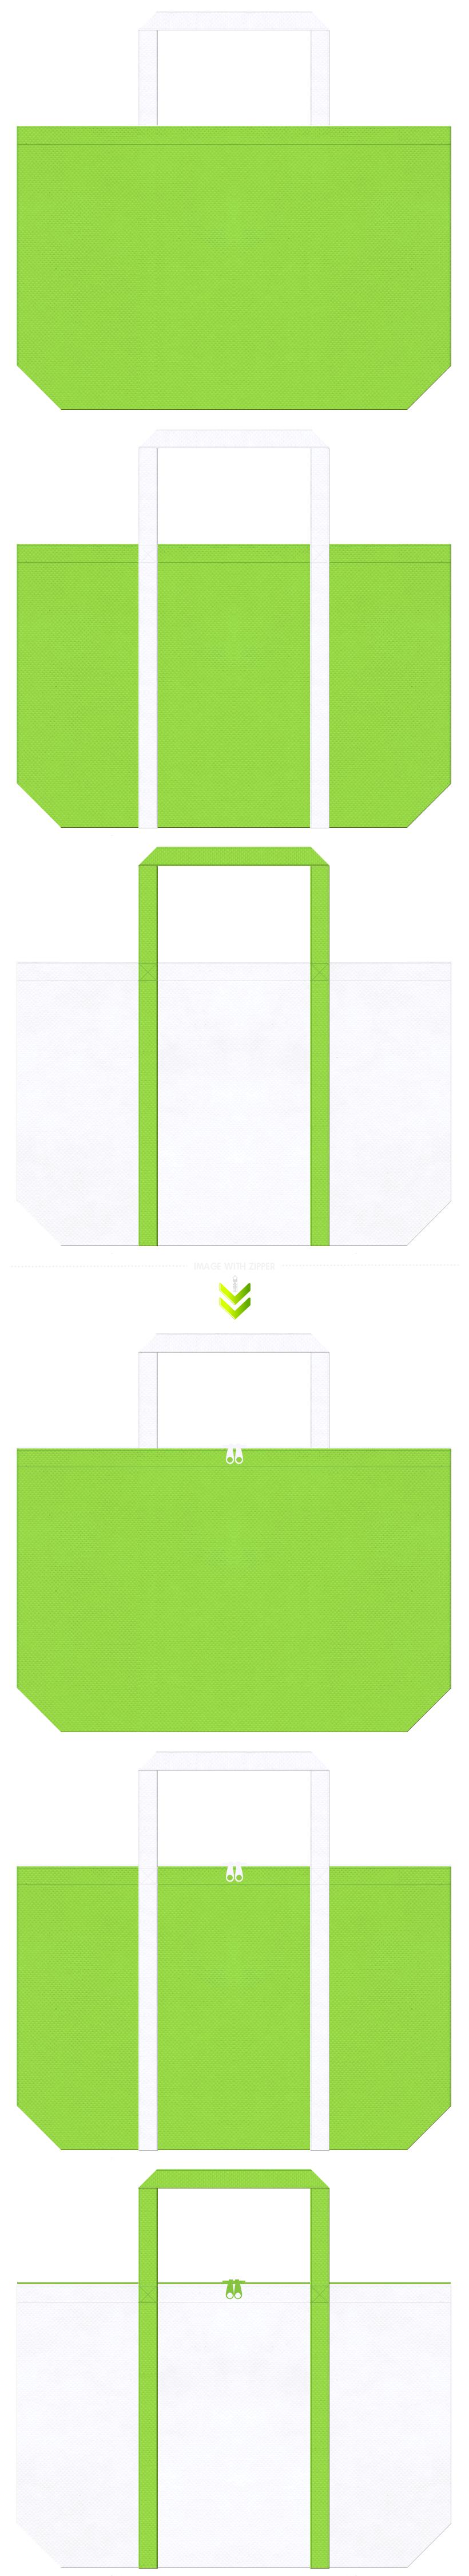 CO2削減・環境イベント・緑化推進・エコイベント・プランター・園芸用品の展示会用バッグ・人工芝・テニスコート・アメリカンフットボール・ゴルフ練習場・アリーナ・スポーツ施設・スポーツ用品のショッピングバッグ・パステルカラーのエコバッグにお奨めの不織布バッグデザイン:黄緑色と白色のコーデ